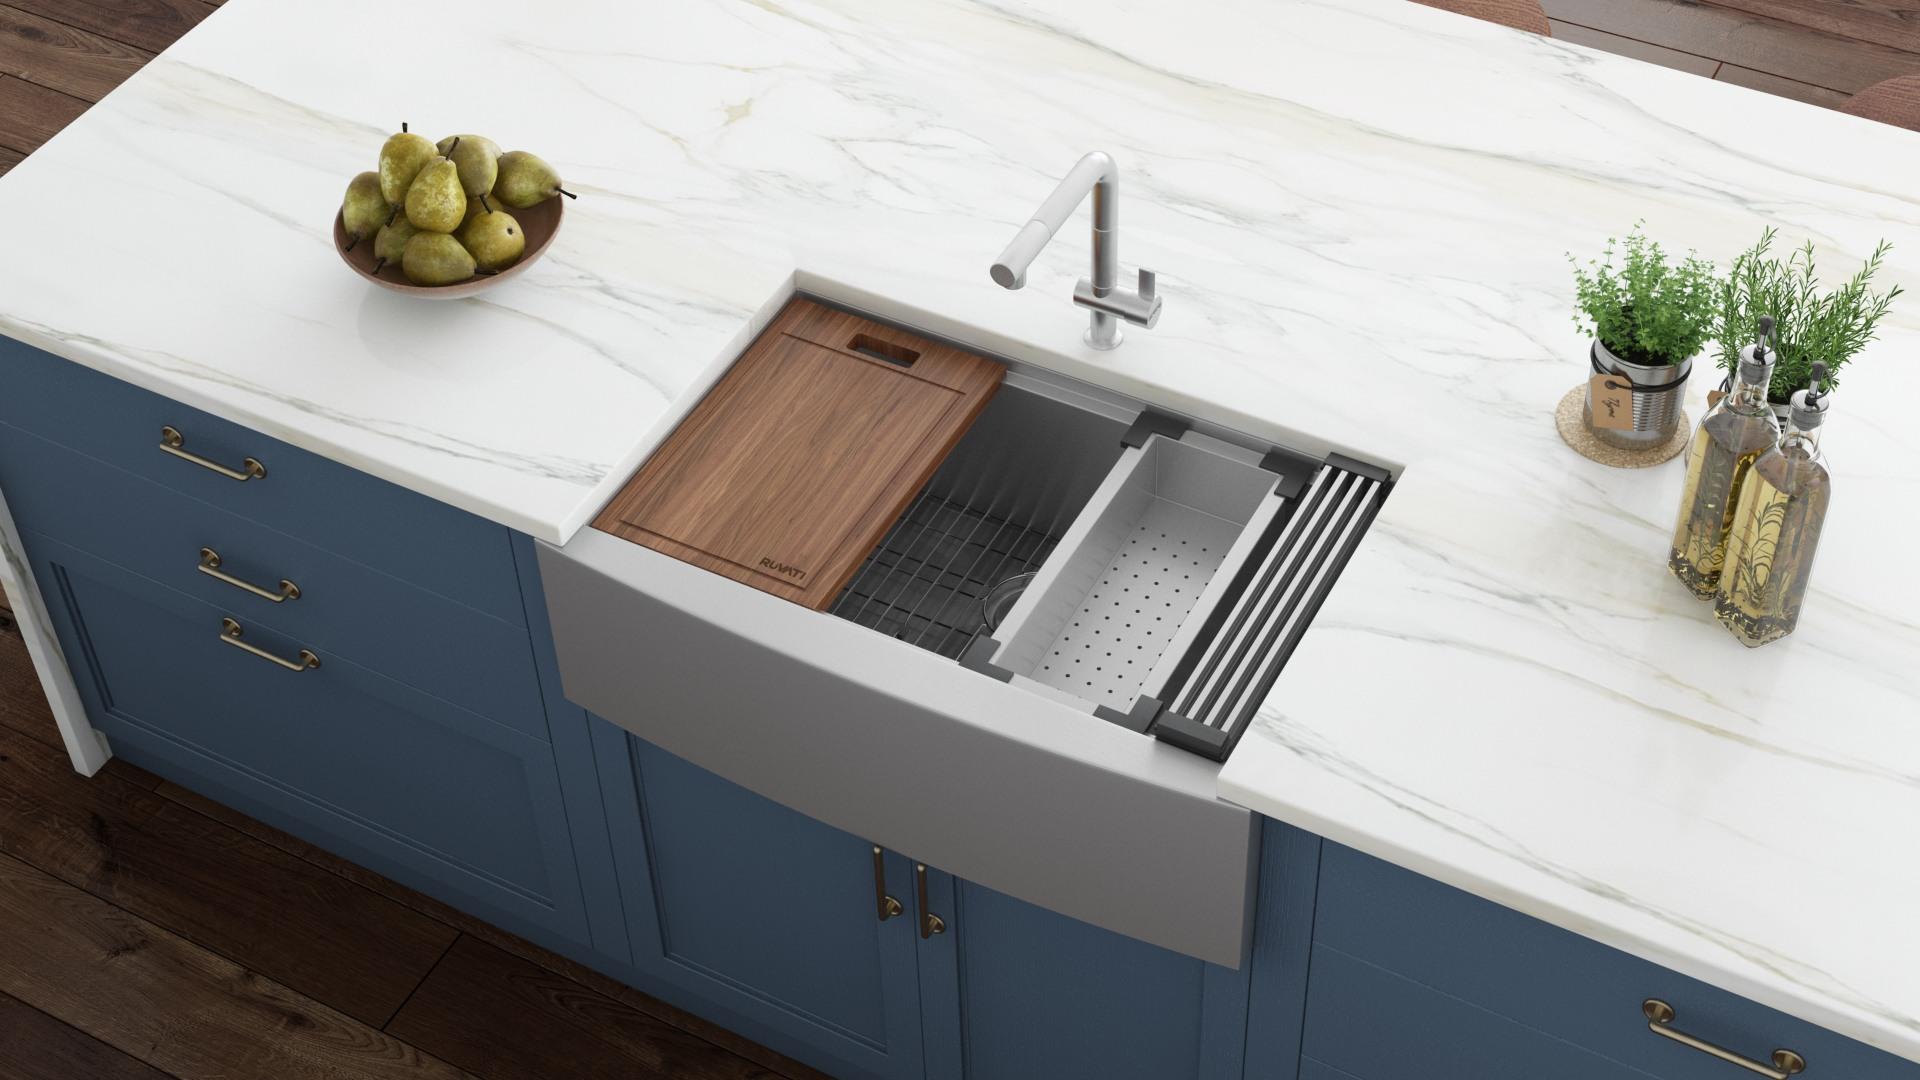 ruvati verona farmhouse apron front 27 in x 22 in stainless steel single bowl workstation kitchen sink